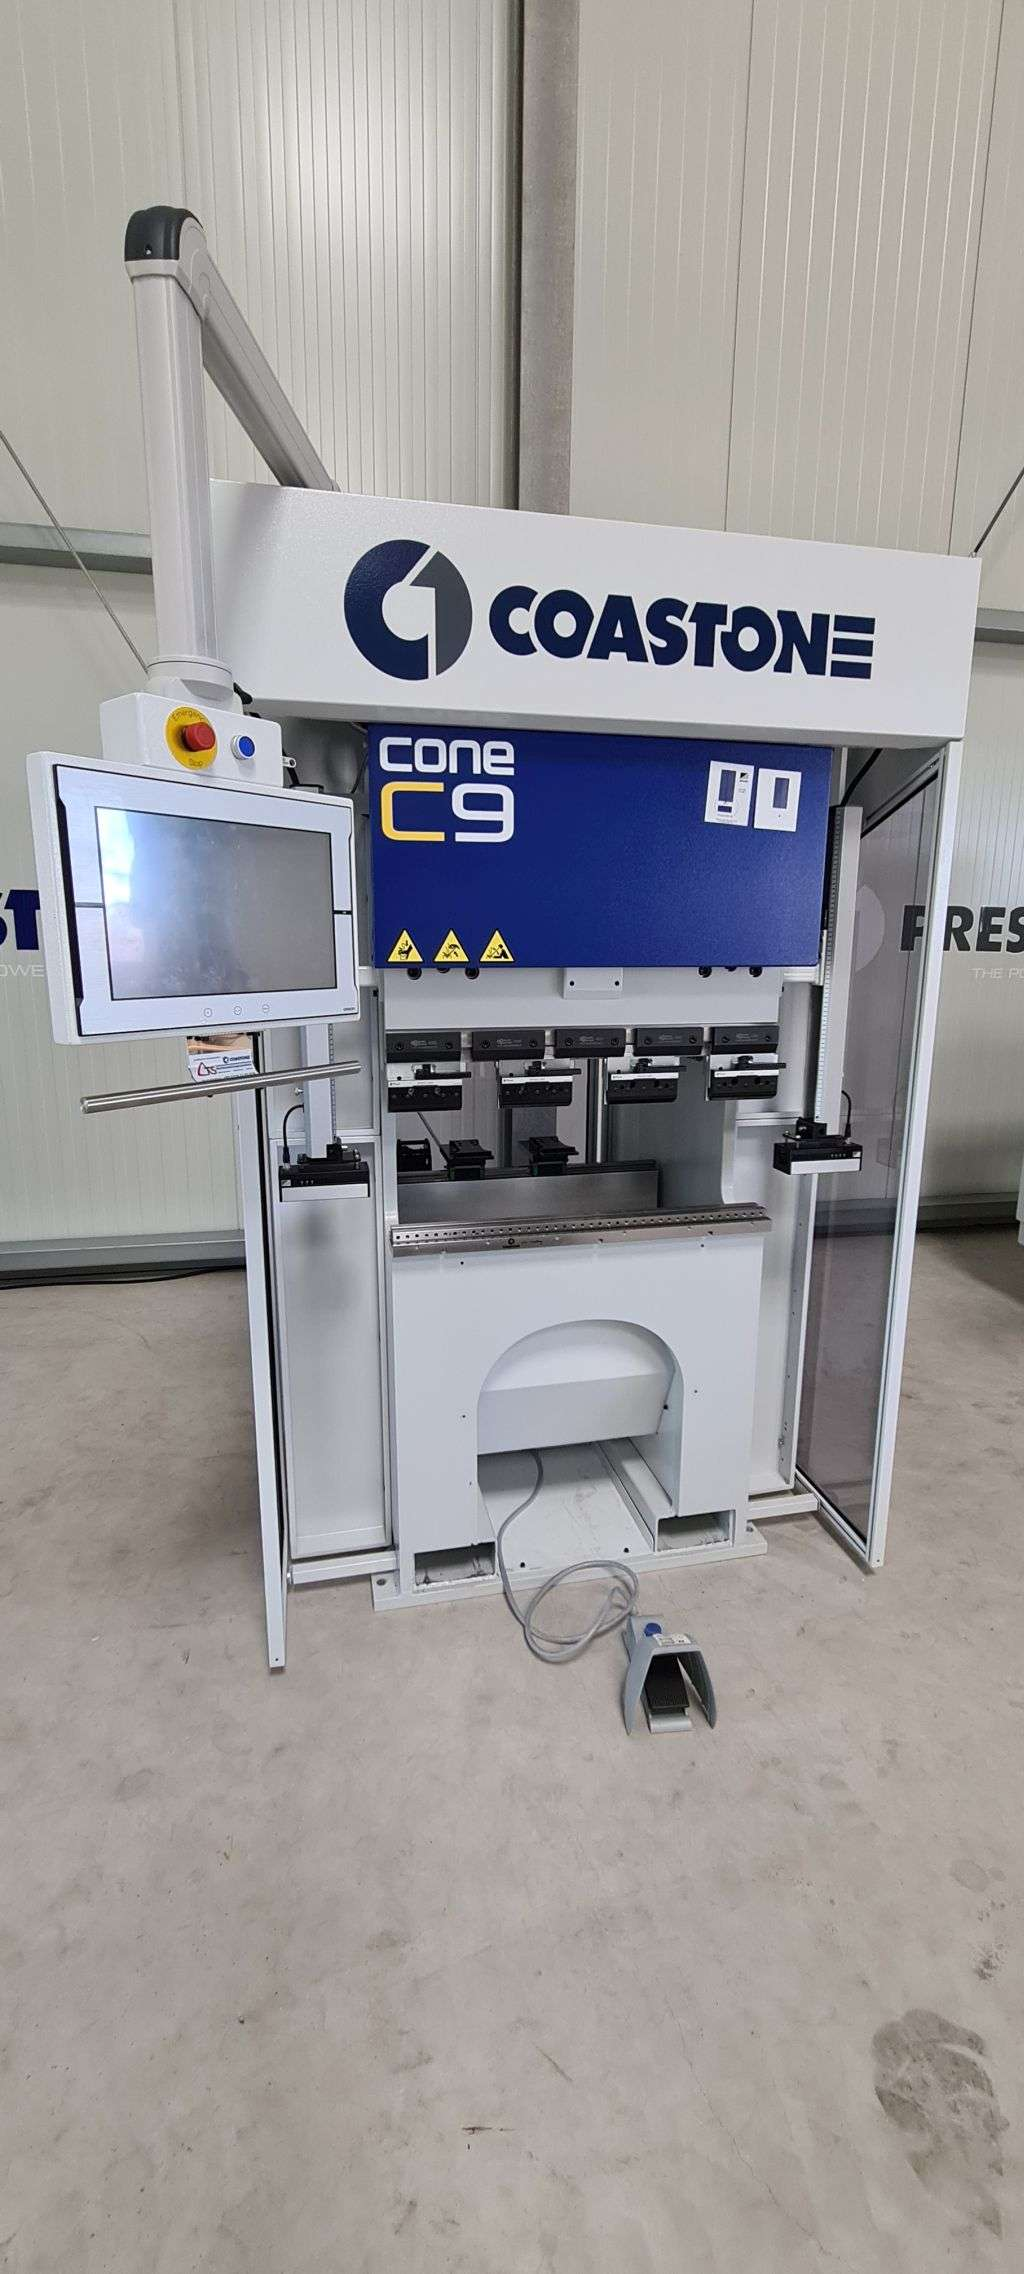 Abkantpresse - elektrisch Kompakte elektrische Abkantpresse C9 CoastOne photo on Industry-Pilot